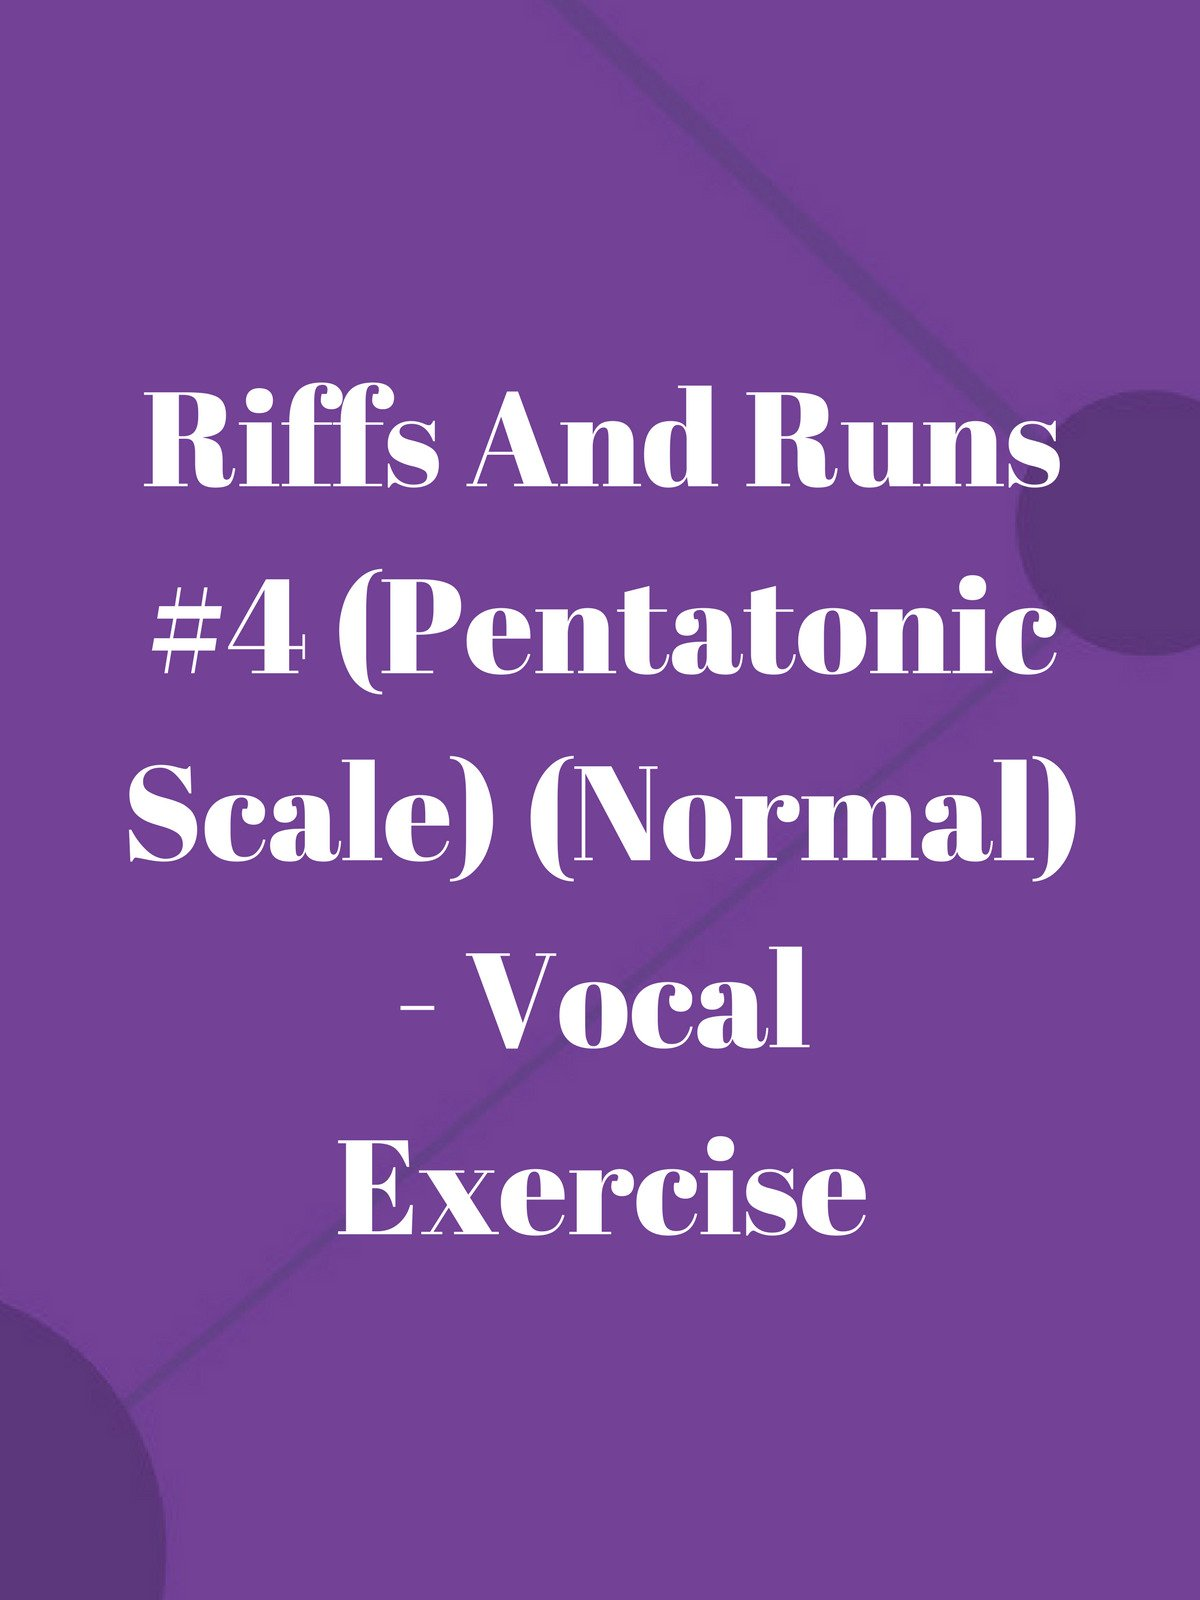 Riffs And Runs #4 (Pentatonic Scale) (Normal)